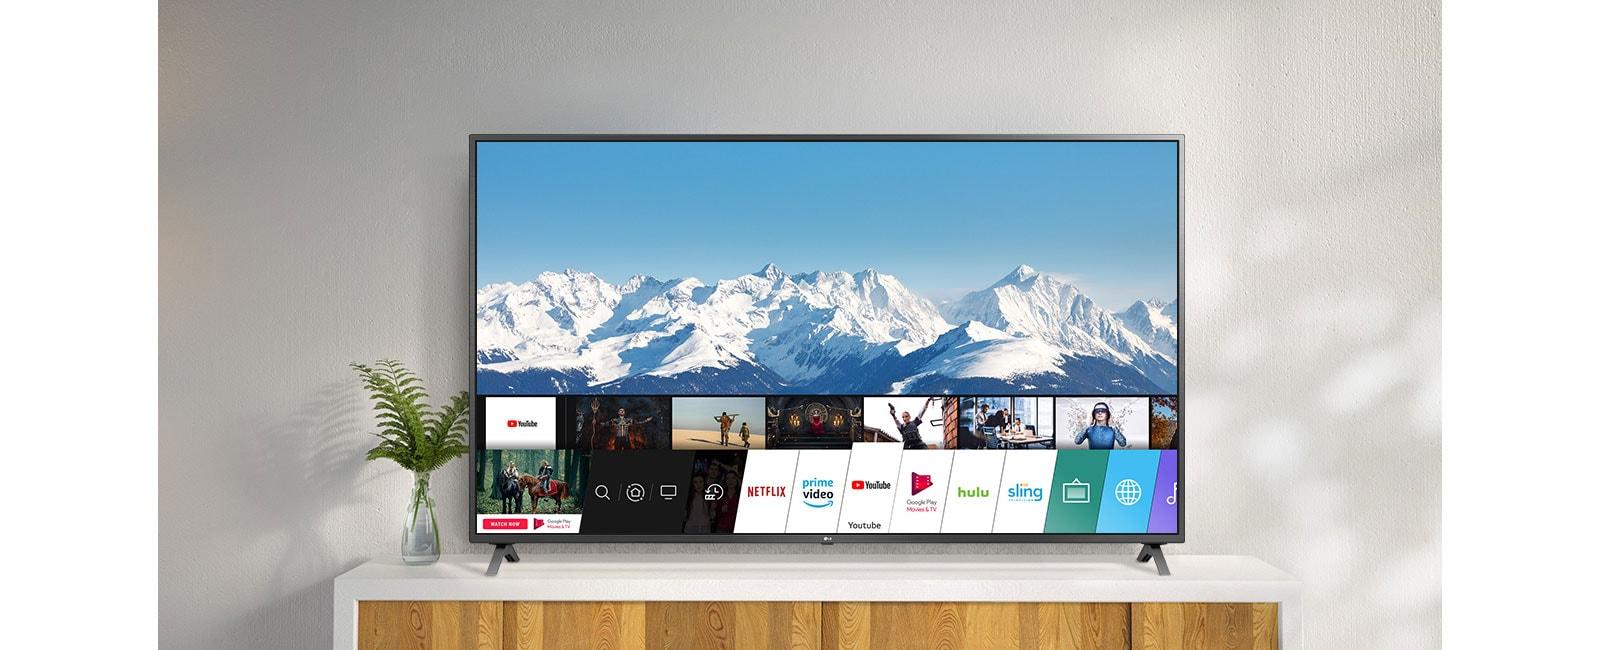 Televizor amplasat pe un suport alb, pe un perete alb. Ecranul TV prezinta ecranul principal cu webOS.